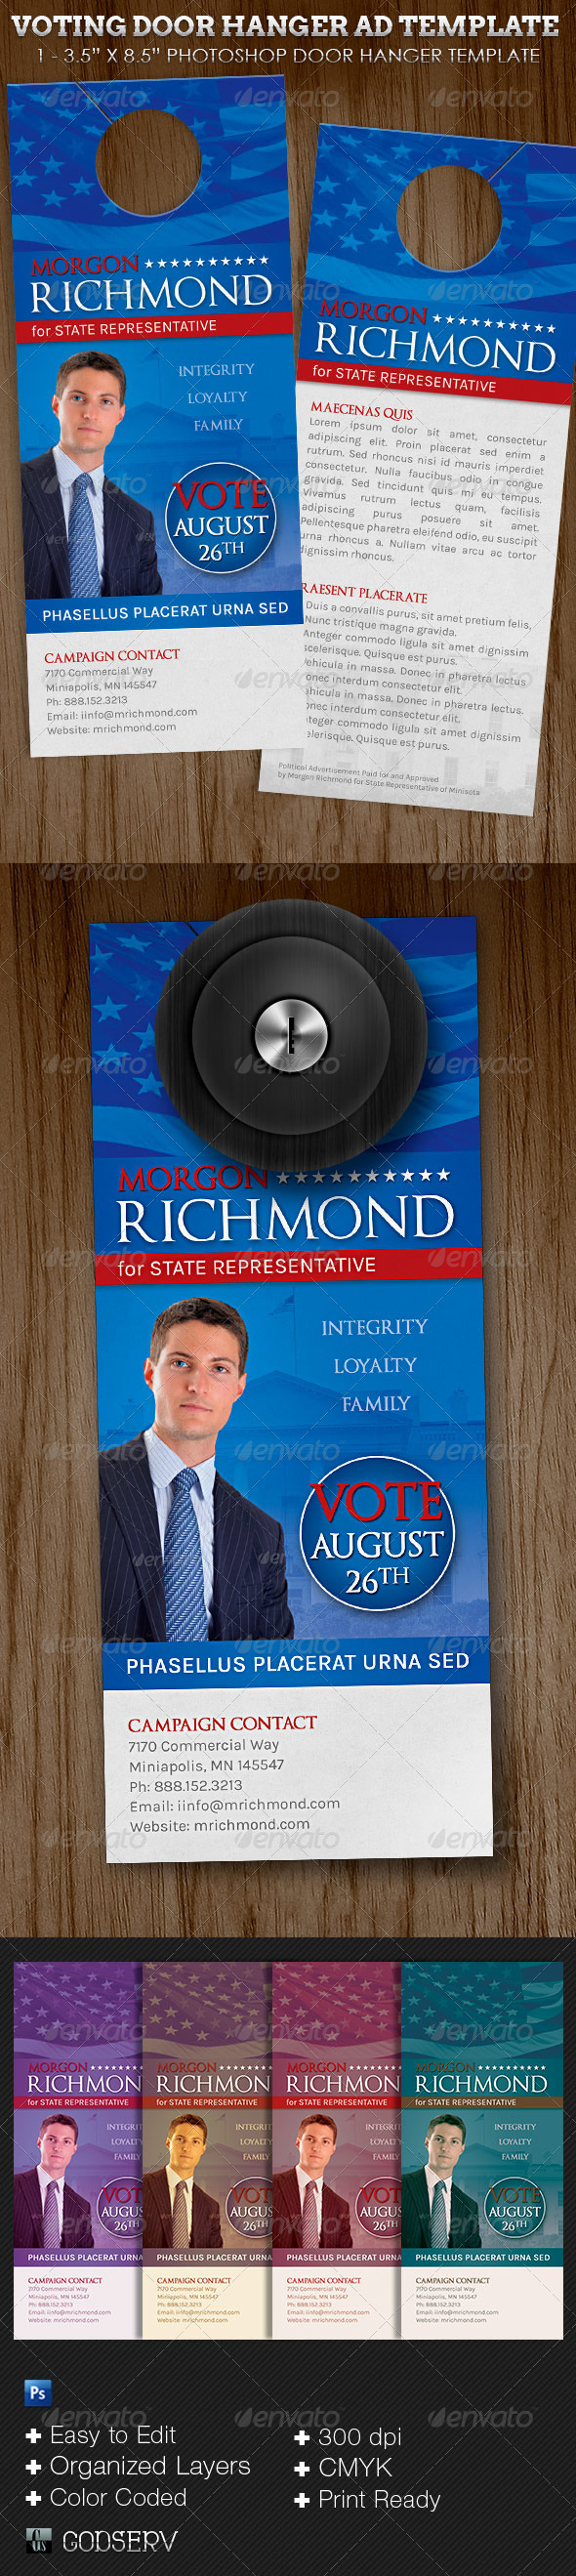 Voting Campaign Door Hanger Template - Miscellaneous Print Templates